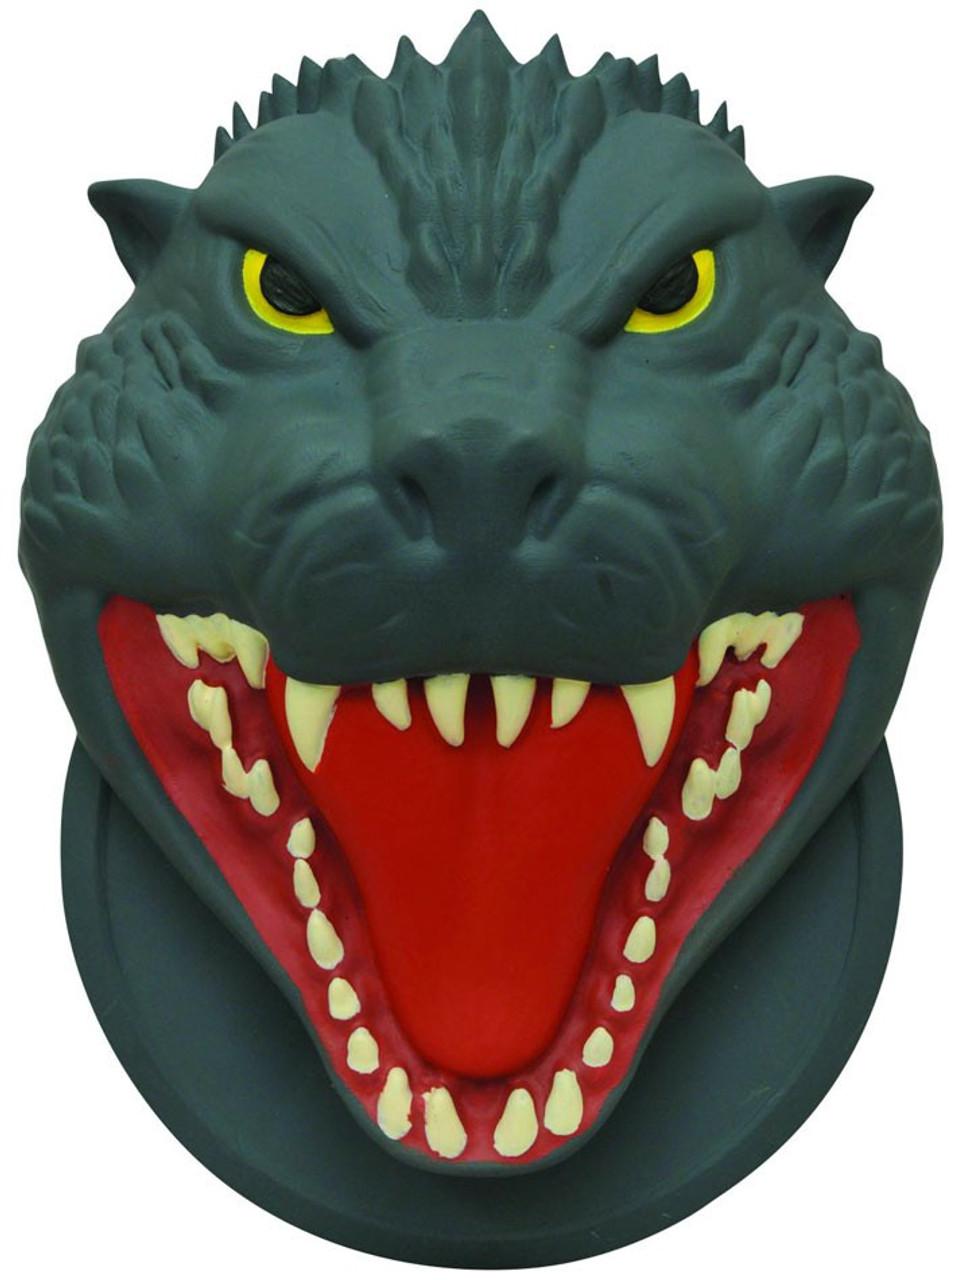 Godzilla 2000 Pizza Cutter